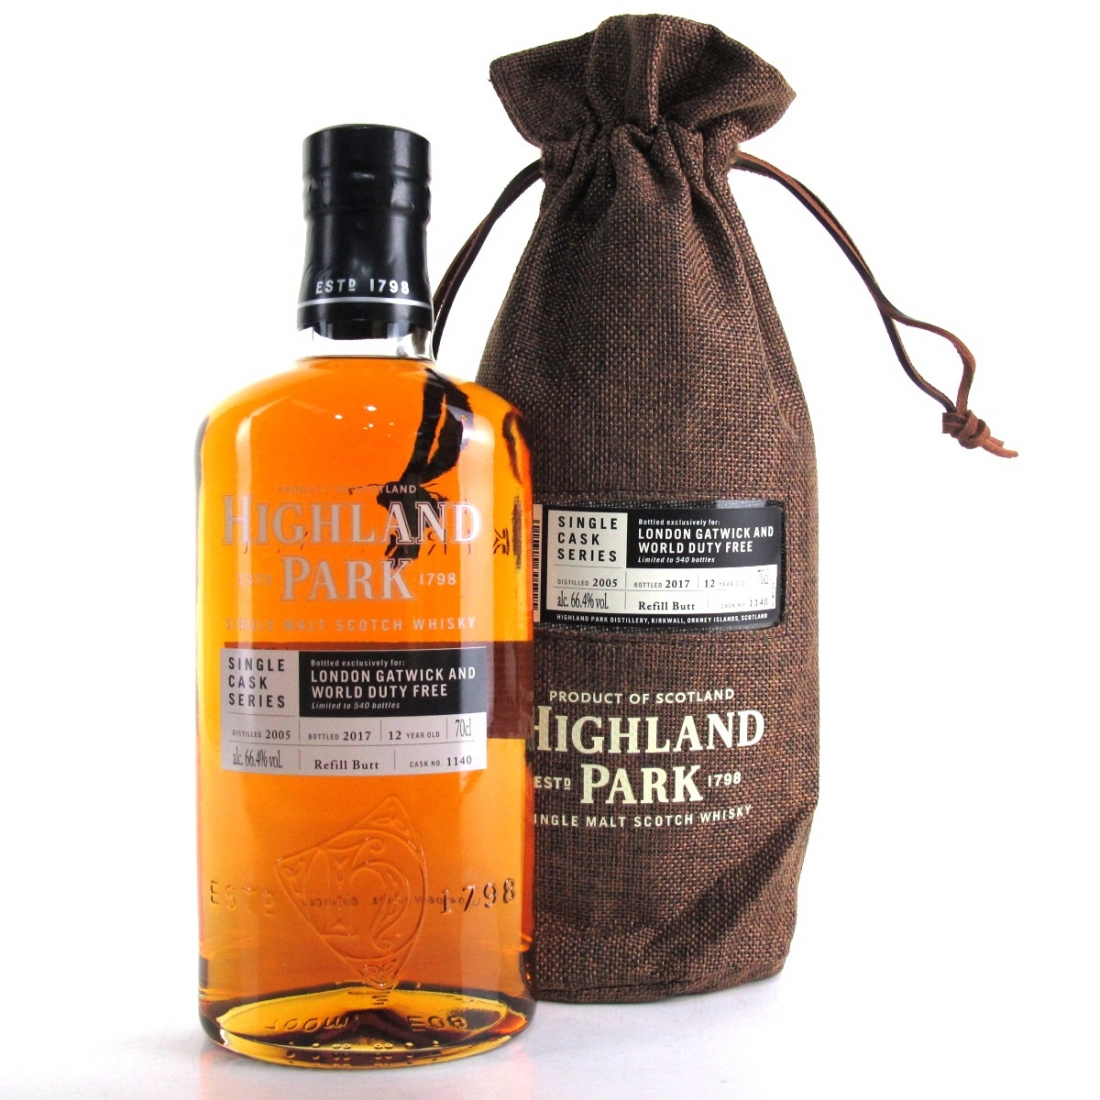 Highland Park 2005 Single Cask 12 Year Old #1140 / London Gatwick and World Duty Free